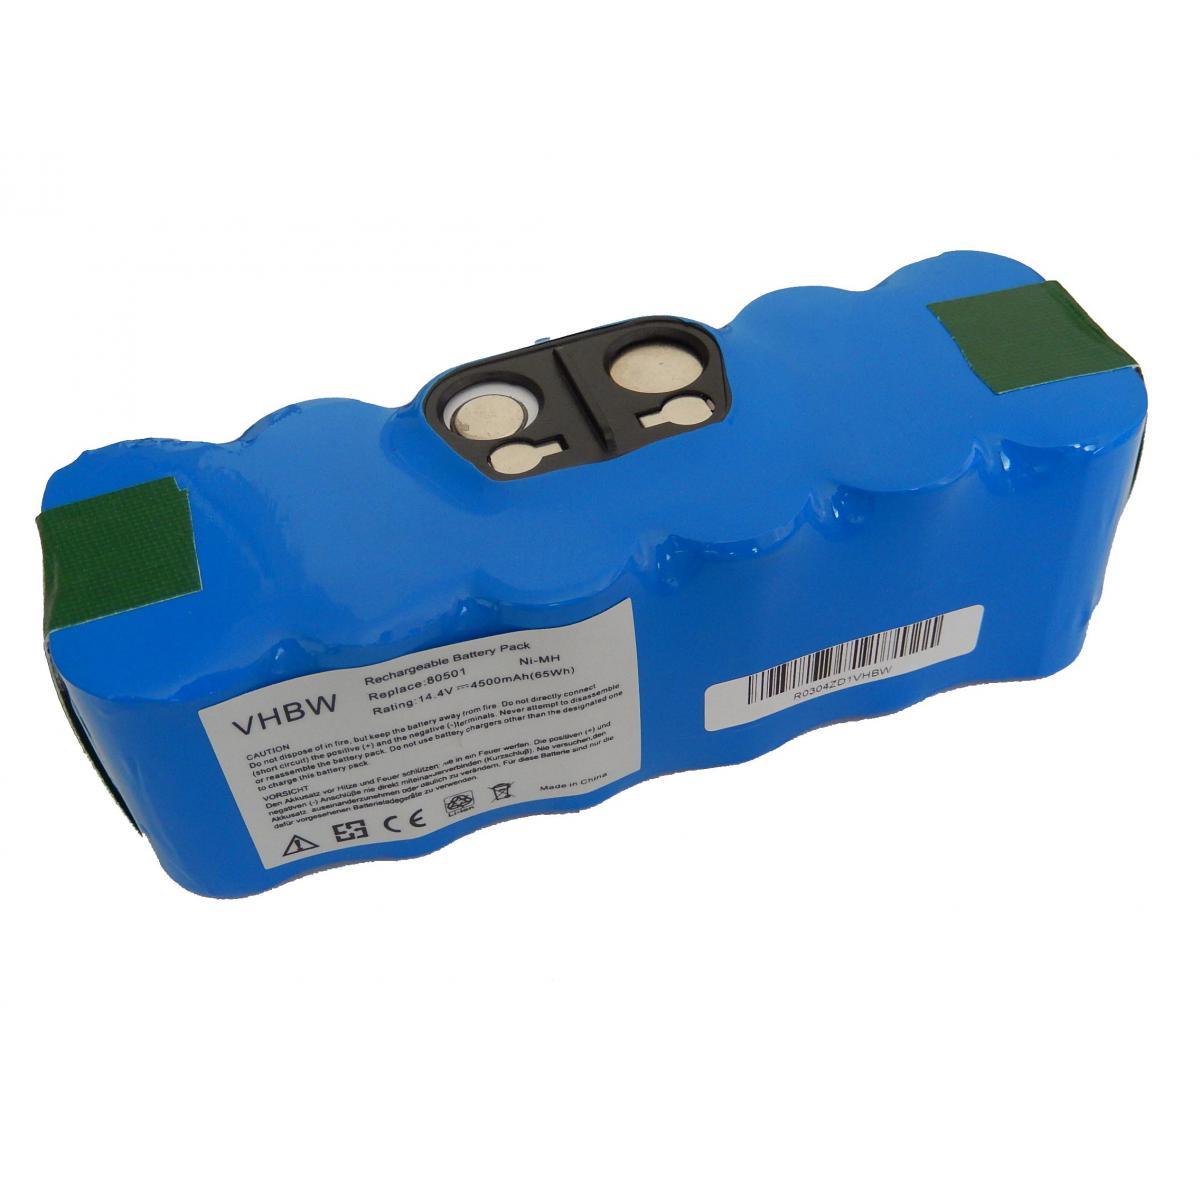 Vhbw vhbw batterie de rechange NiMH 4500mAh (14.4V) compatible avec iRobot Roomba 500, 600, 700, 800, 900 Series aspirateur